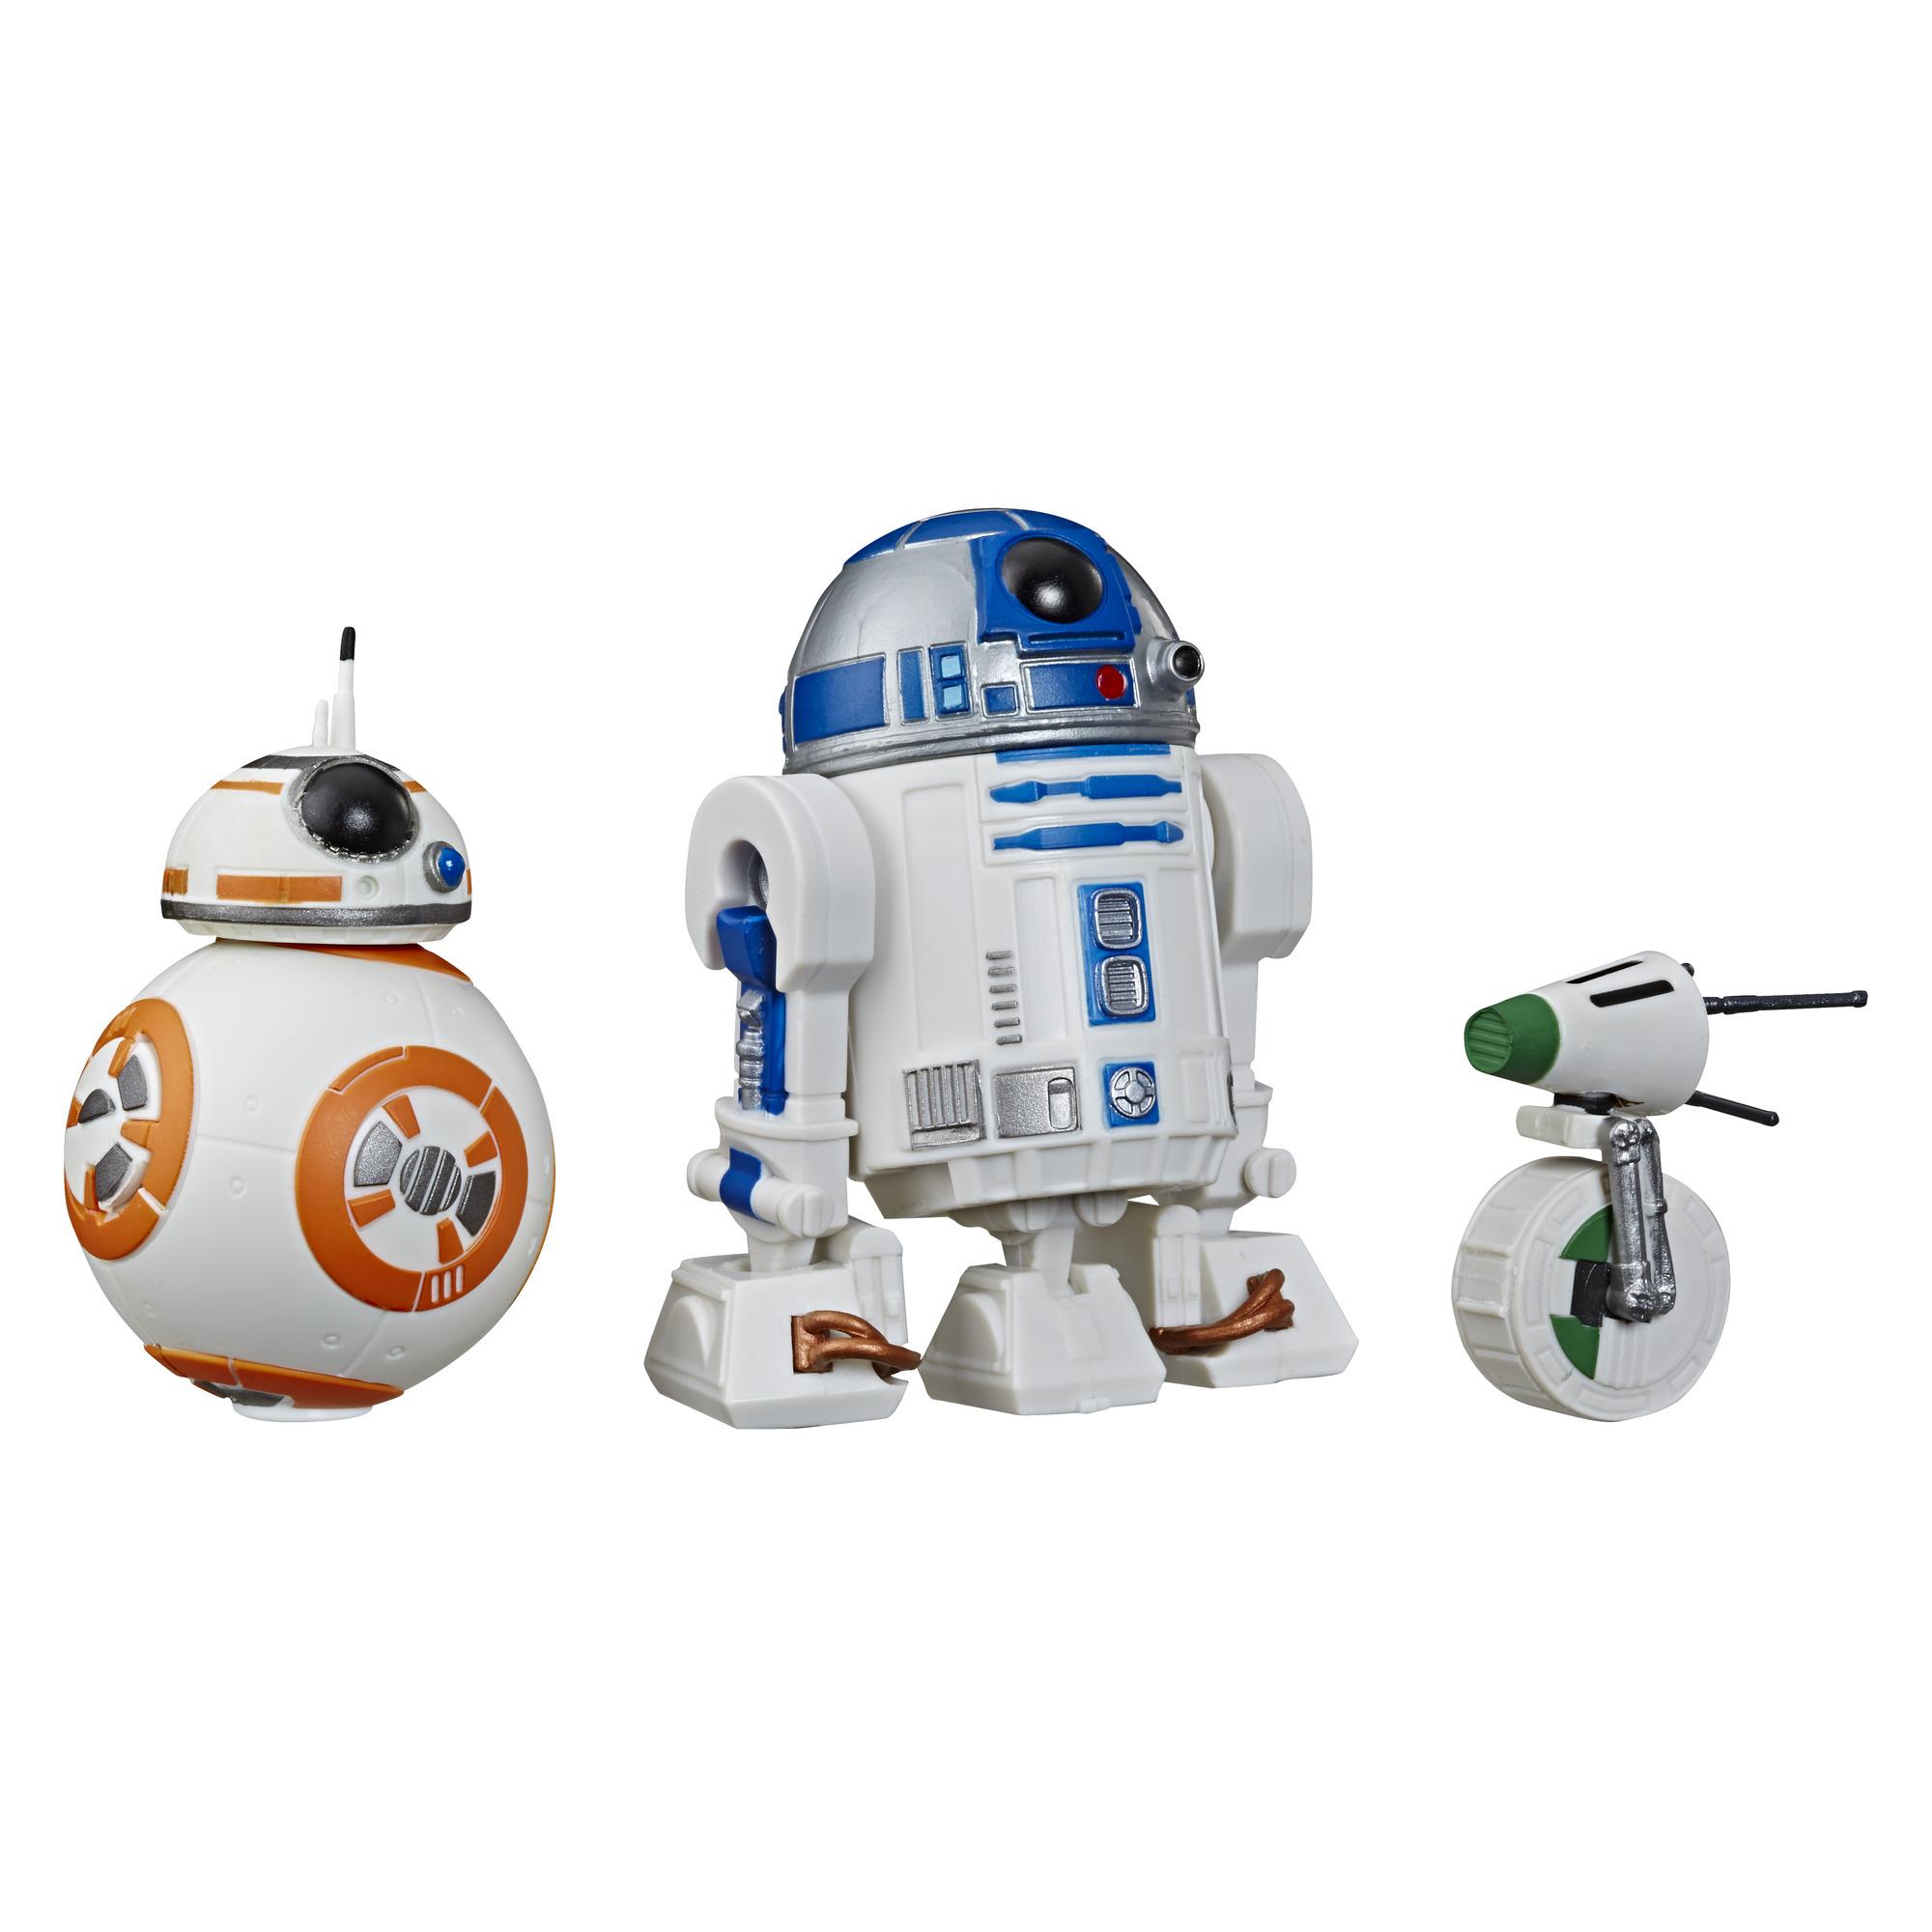 TROS Galaxy of Adventures R2-D2, BB-8, D-O Figure 3-Pack 2